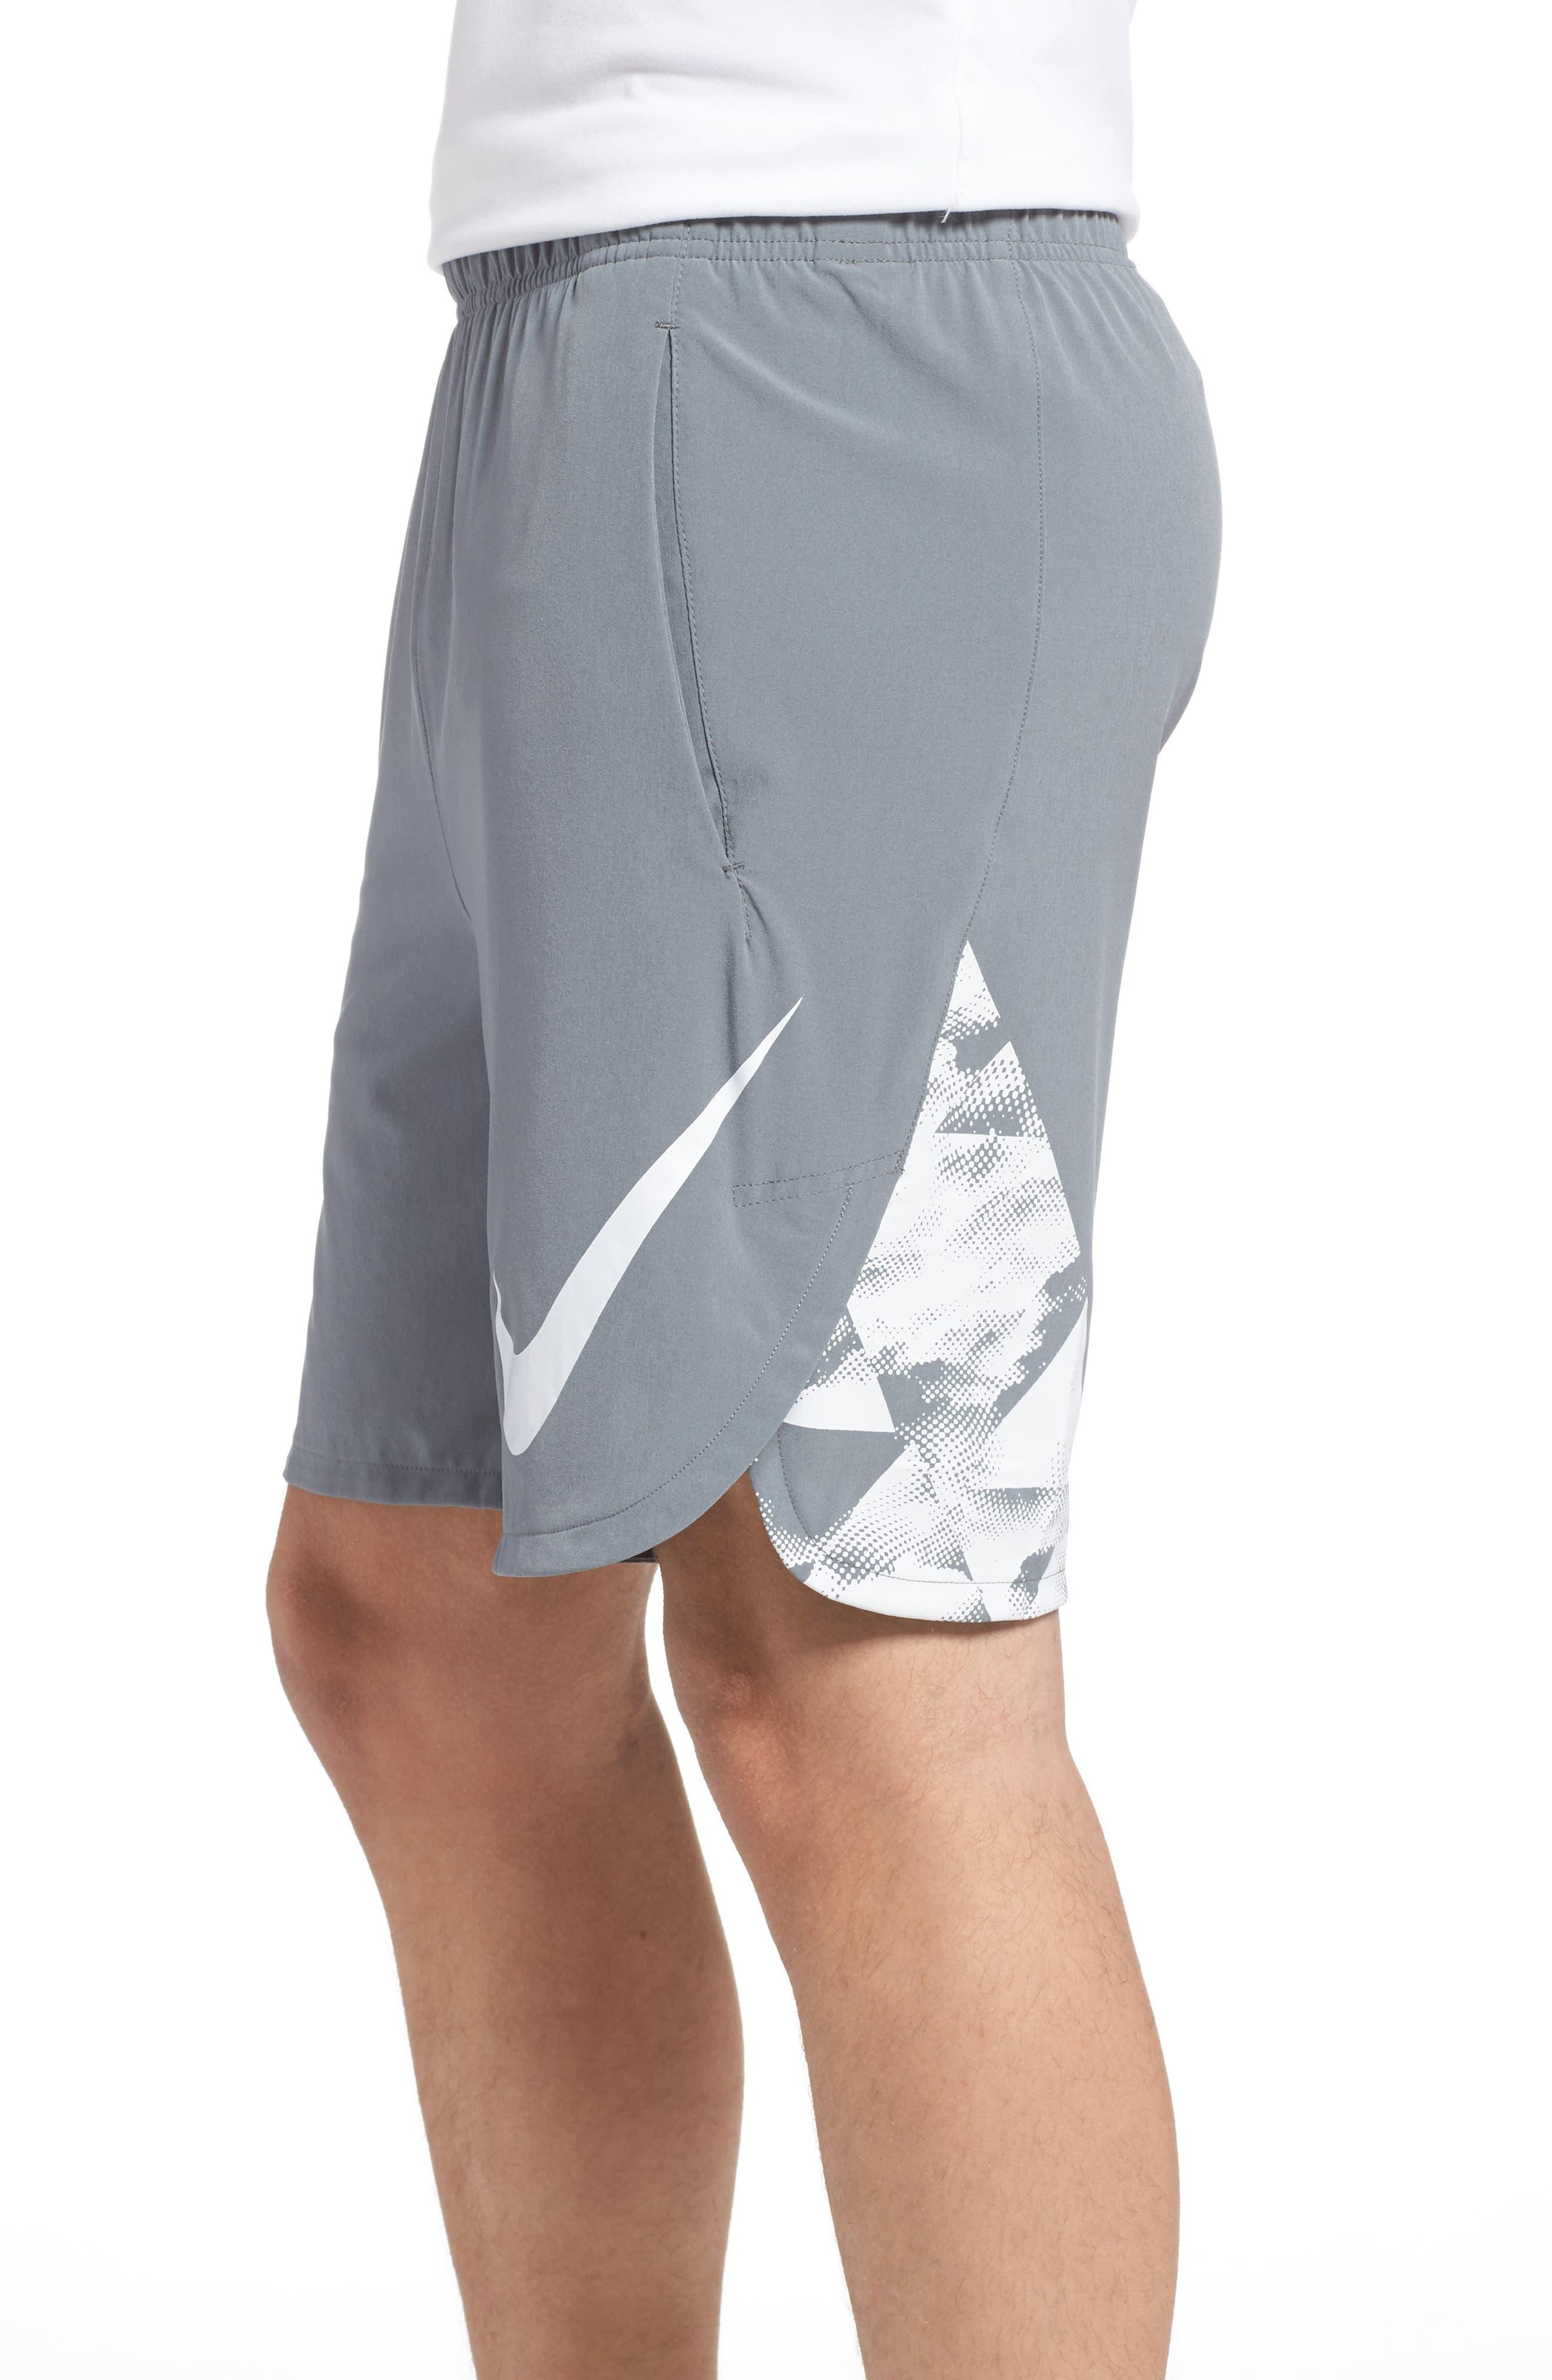 Flex Training Shorts,                             Alternate thumbnail 6, color,